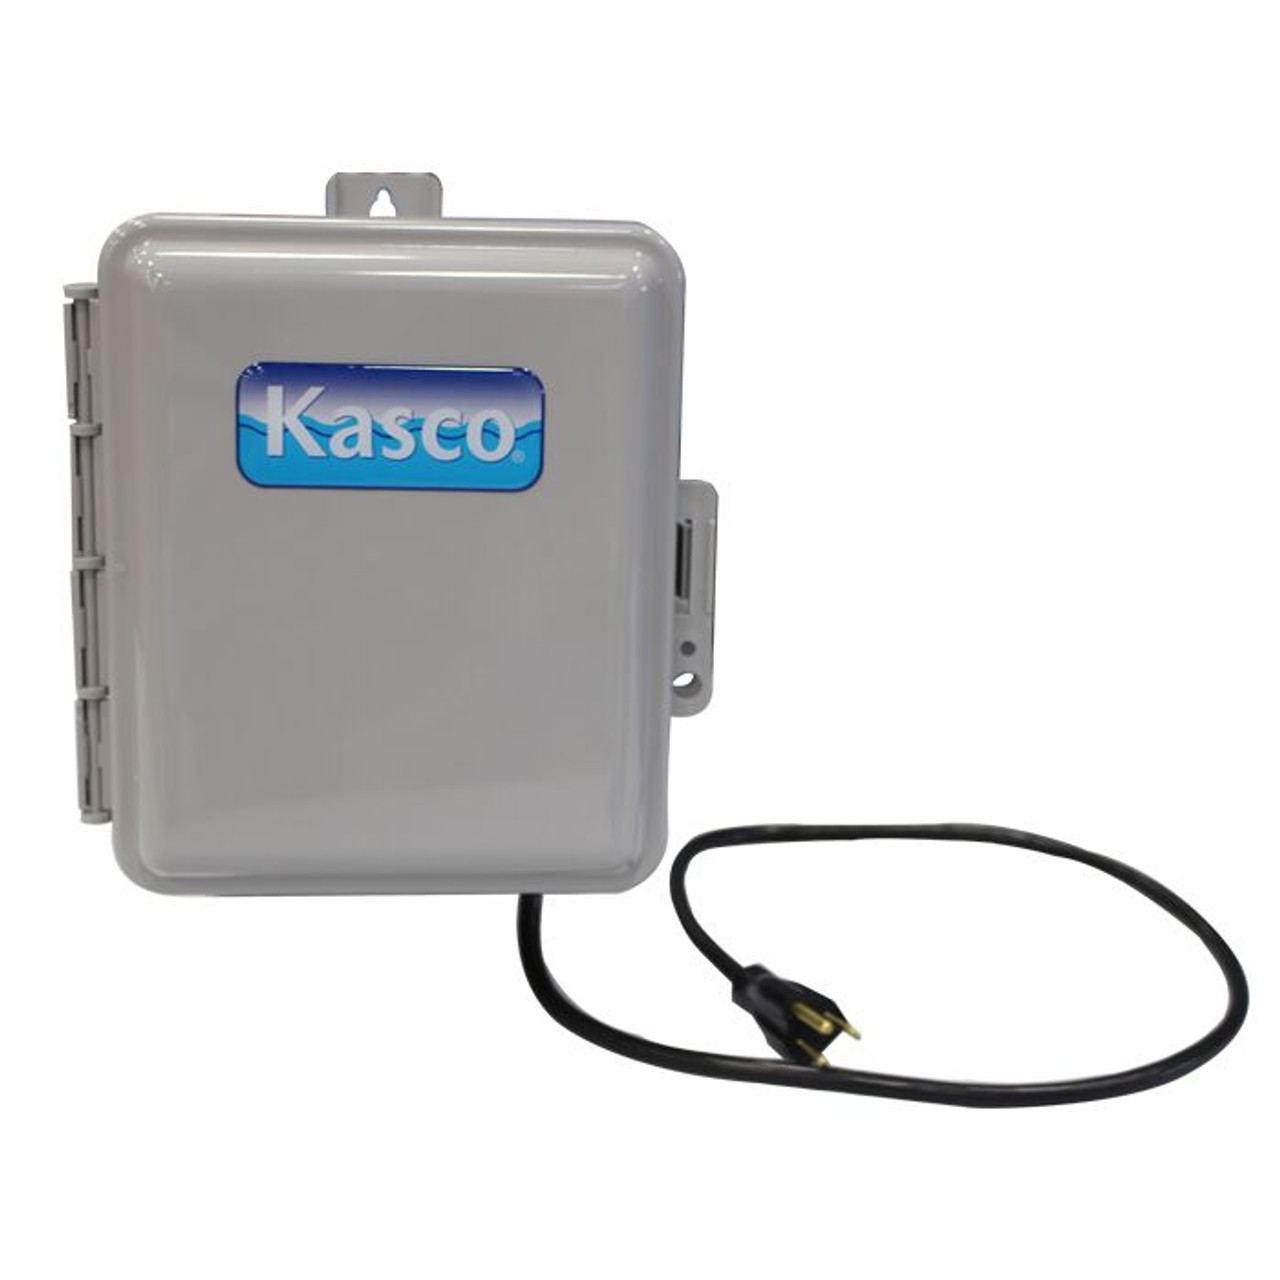 Kasco RGB LED Light Set - 3 Lights